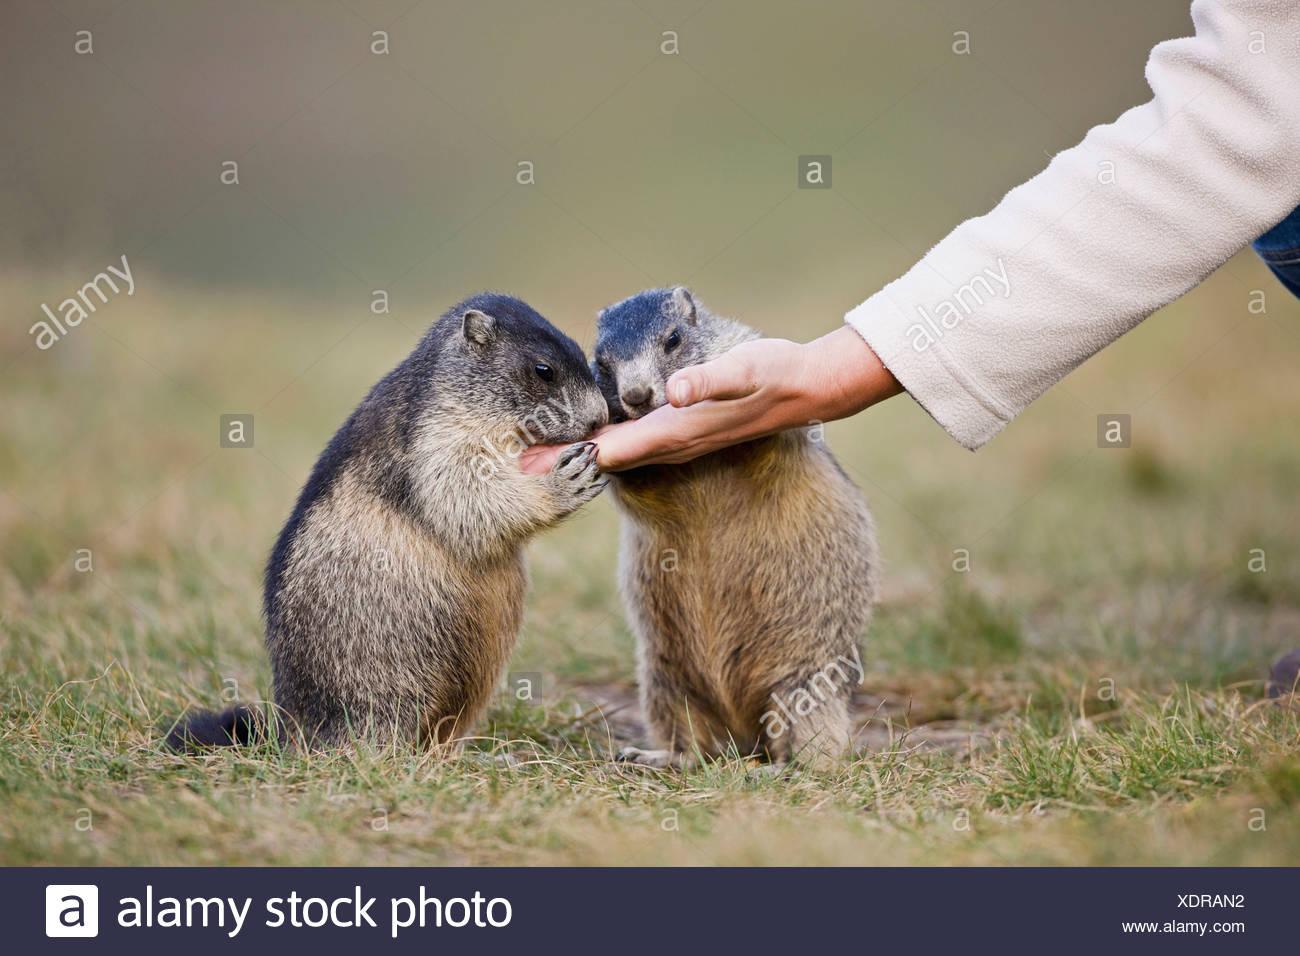 Austria, Person feeding Alpine Marmots (Marmota marmota) - Stock Image